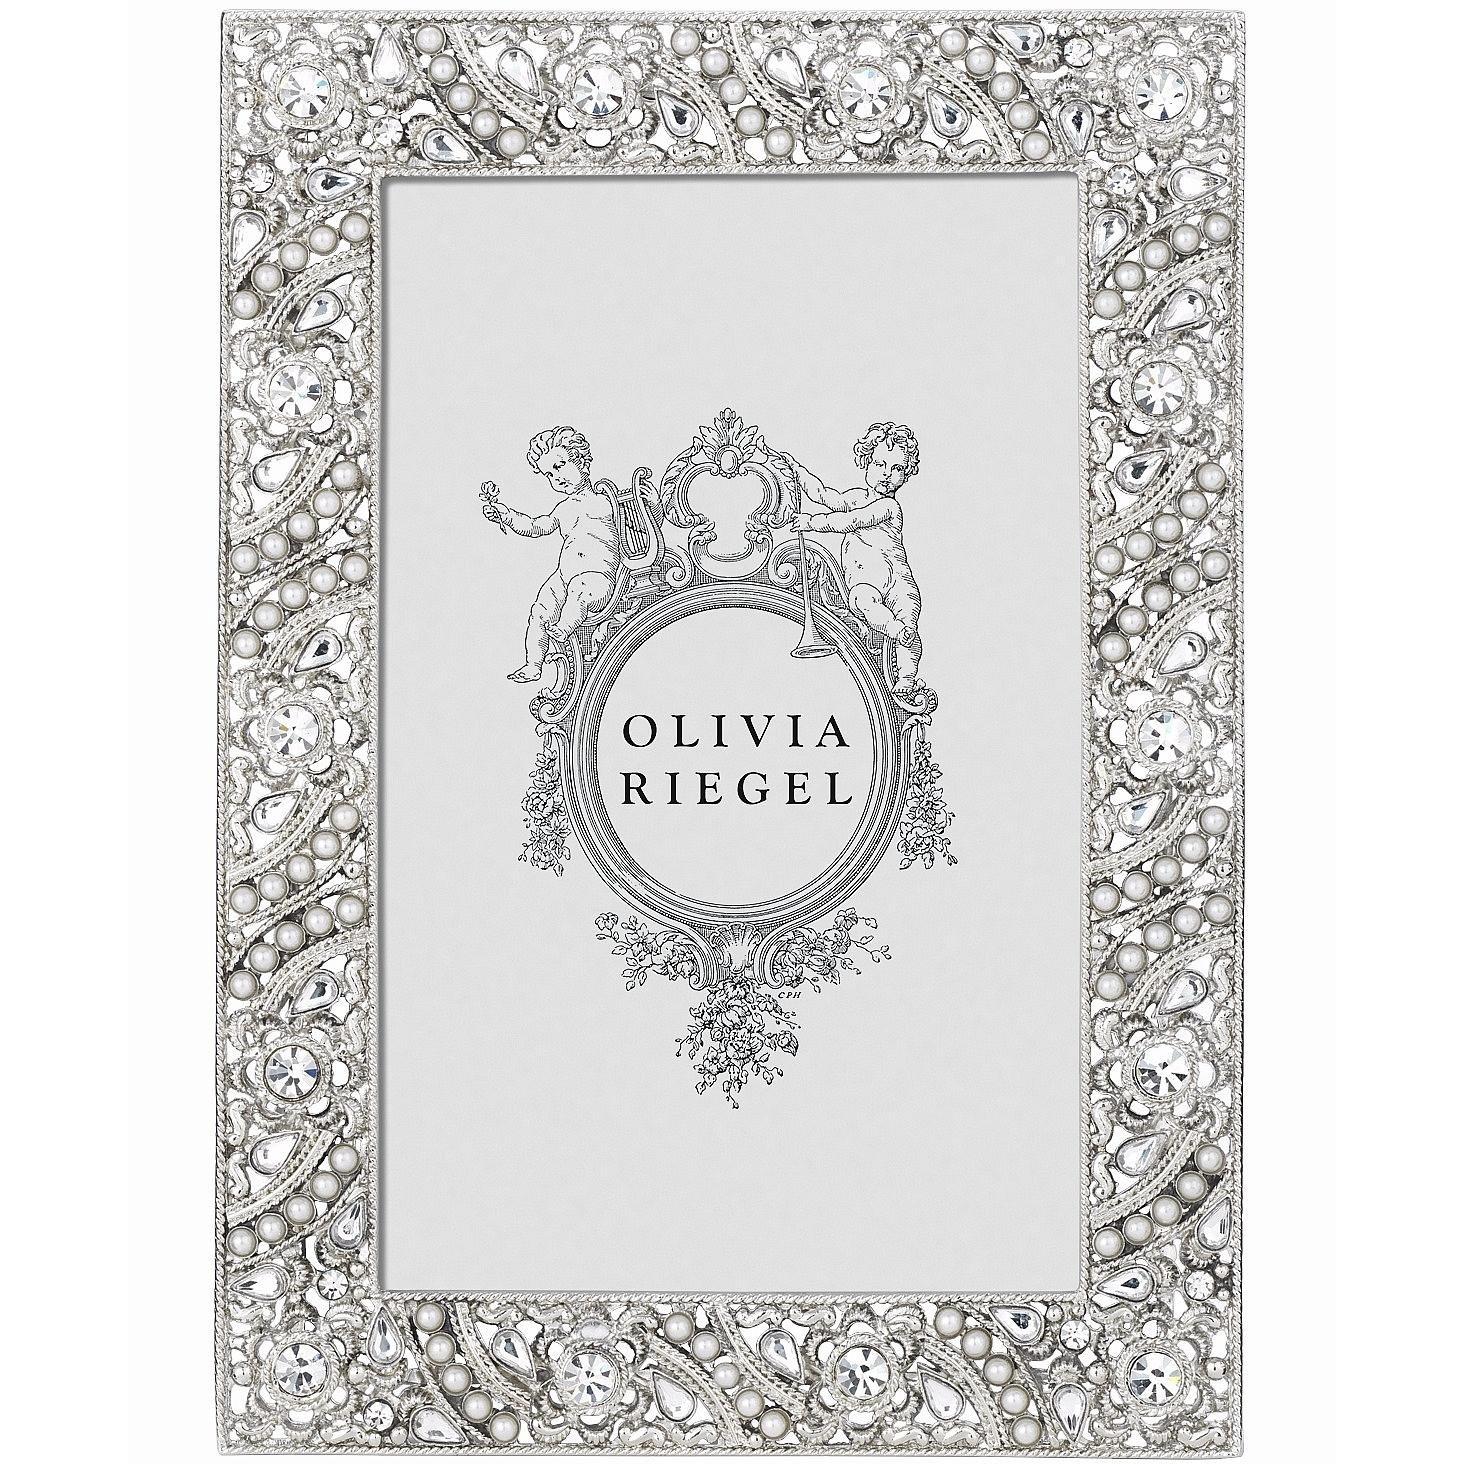 ELOISE Austrian Perle & Crystal 4x6 frame by Olivia Riegel - 4x6 by Olivia Riegel